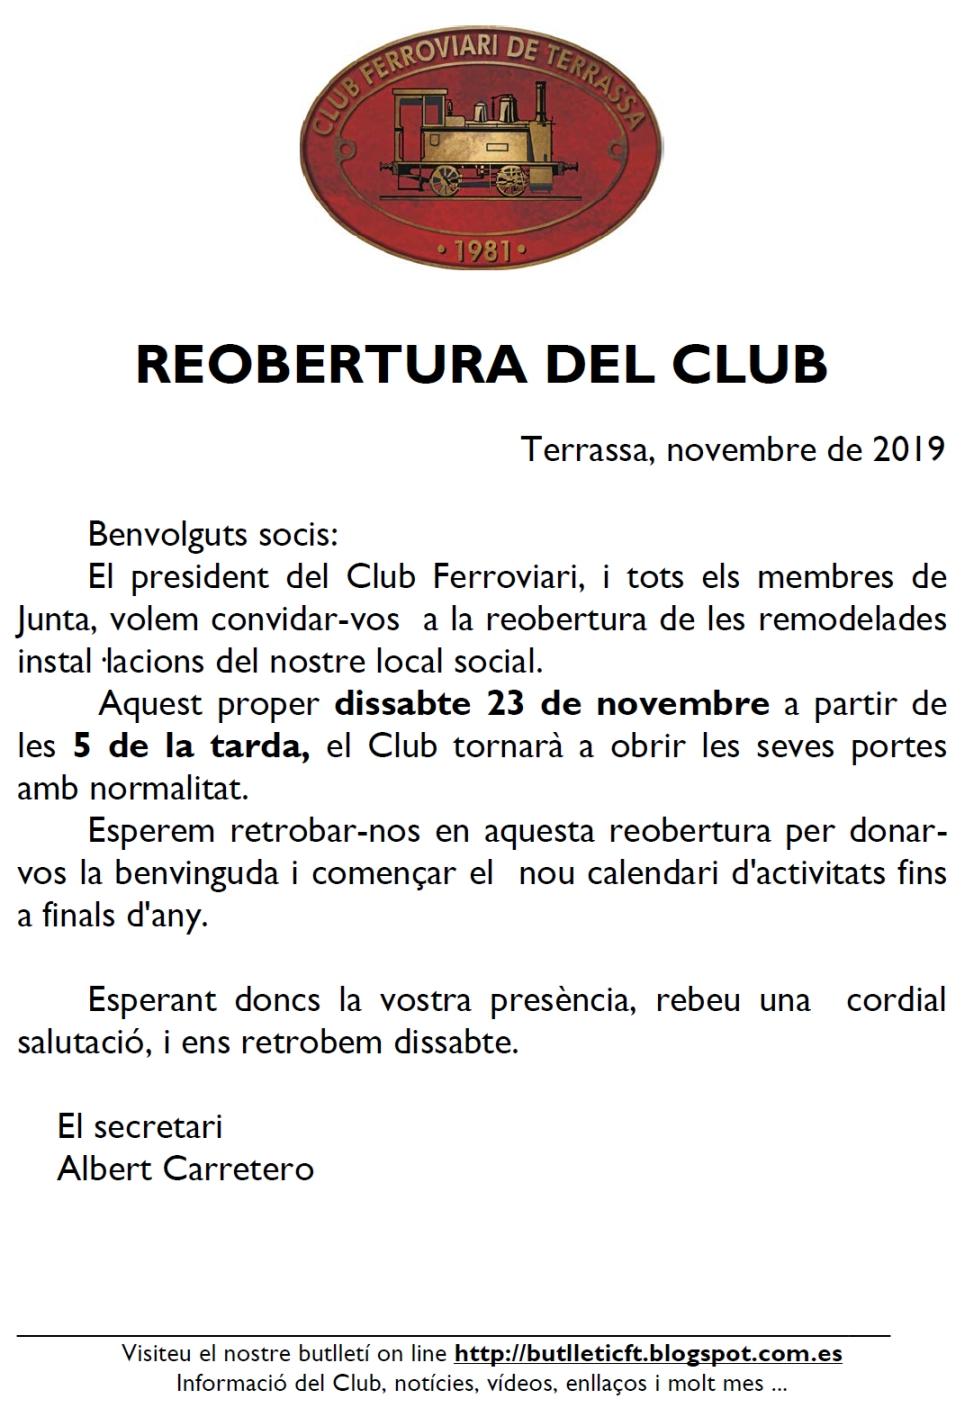 *** Reobertura del local del Club Ferroviari de Terrassa